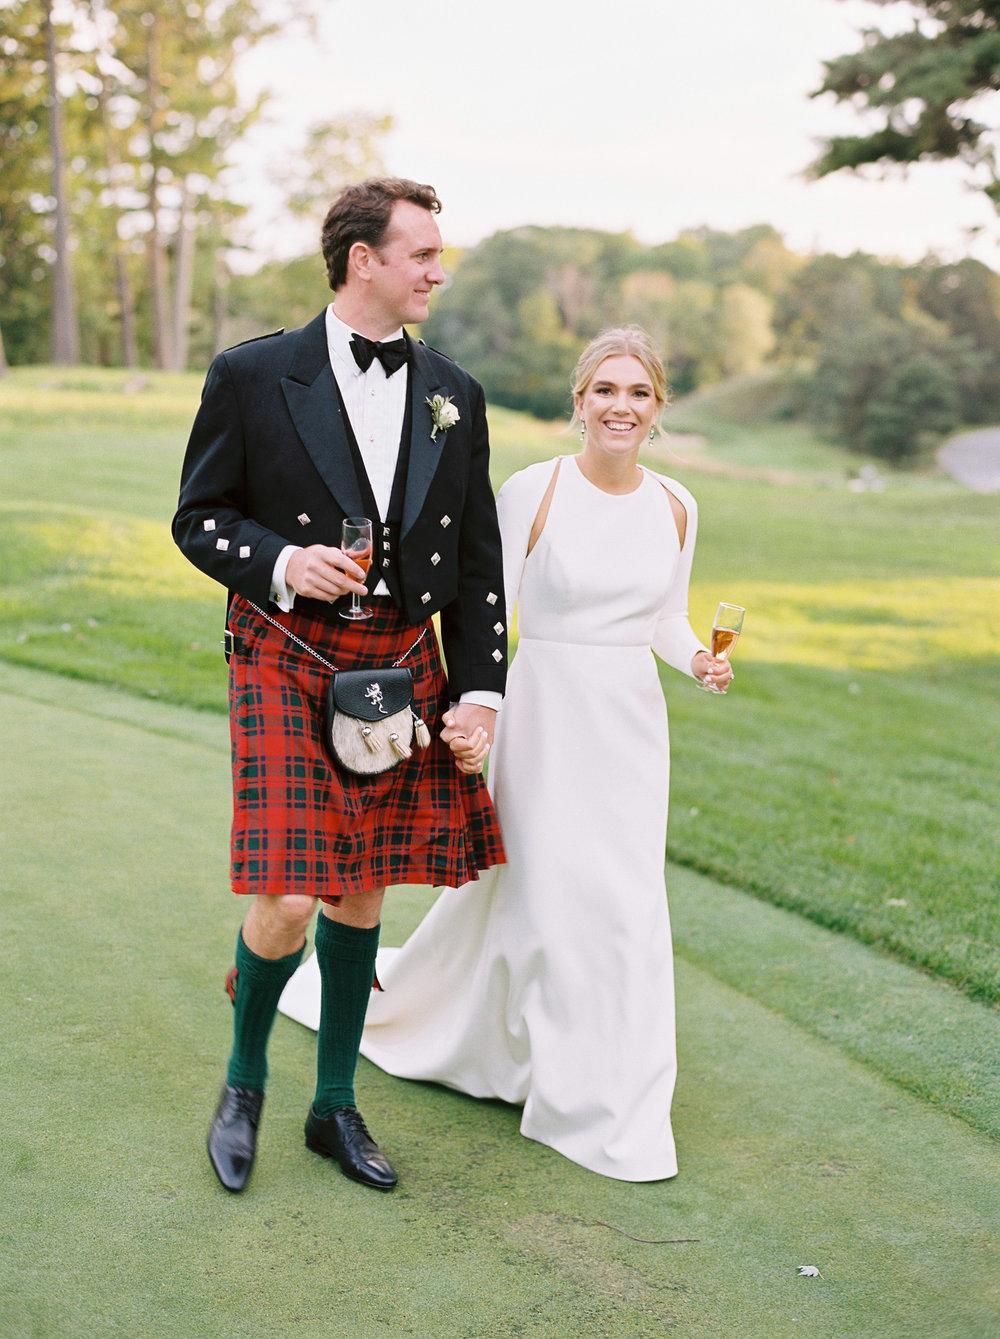 0604-Geneva-Ian-Wedding-Toronto Golf Club-When He Found Her-TorontoPhotographer.jpg